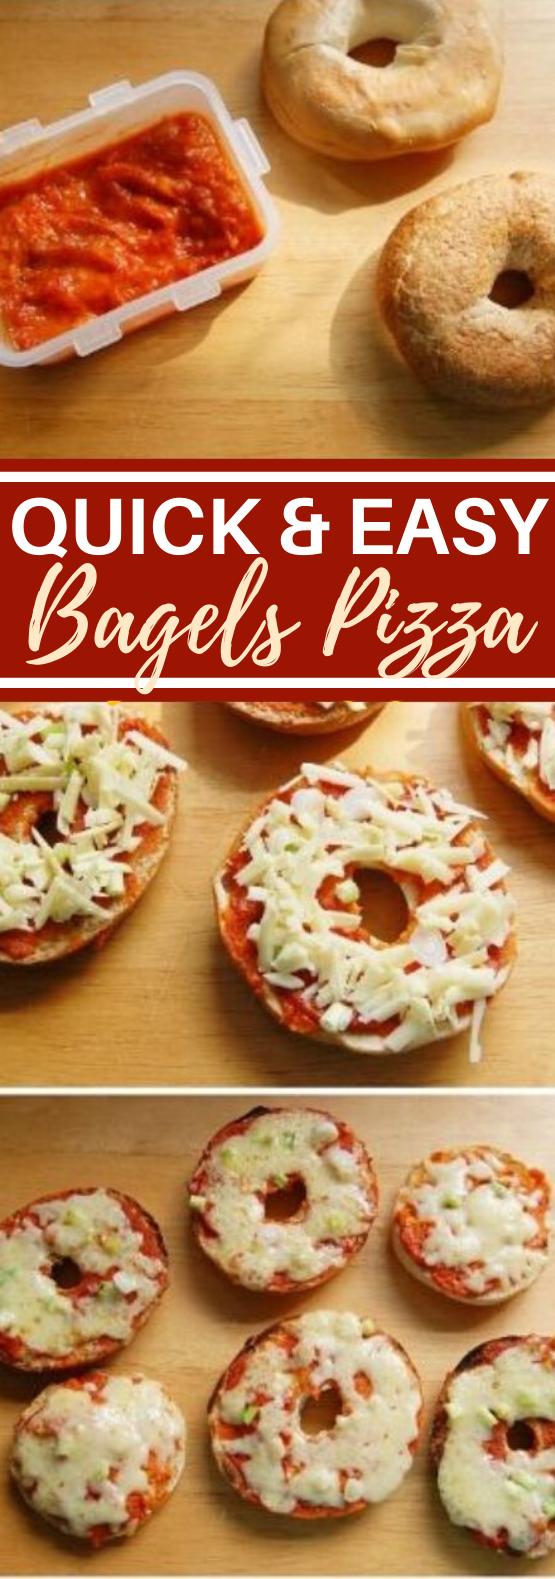 Freezer Pizza Bagels #easy #lunch #dinner #mealprep #quick